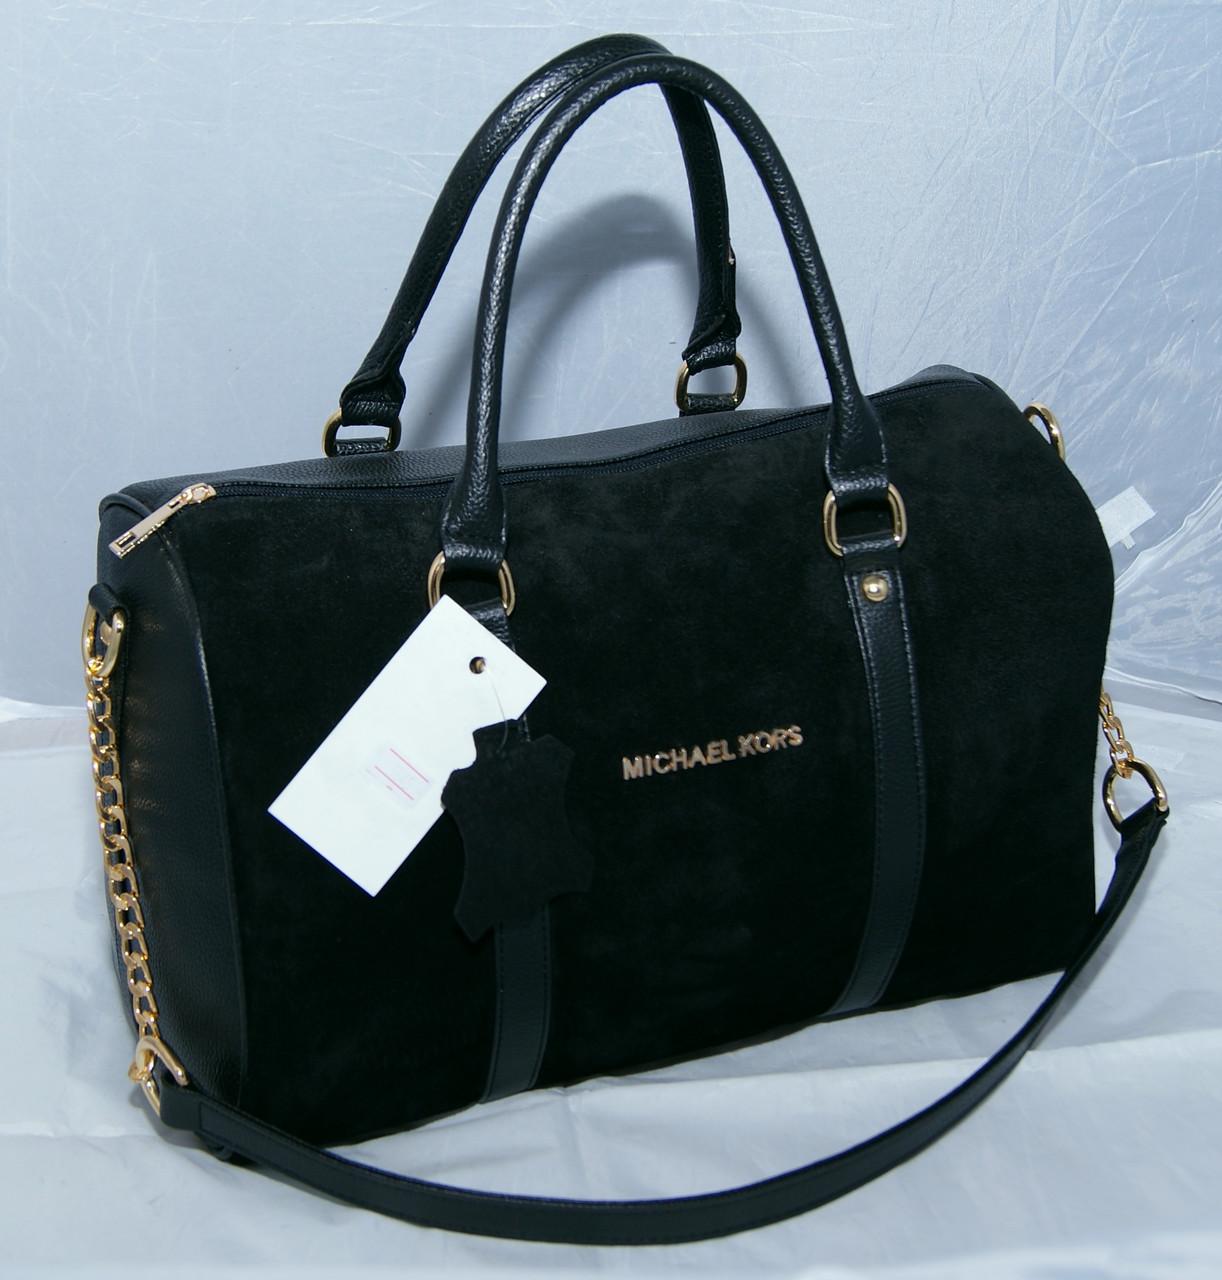 8fc1165d24e3 Женская замшевая сумка саквояж Michael Kors, черная Майкл Корс MK ...